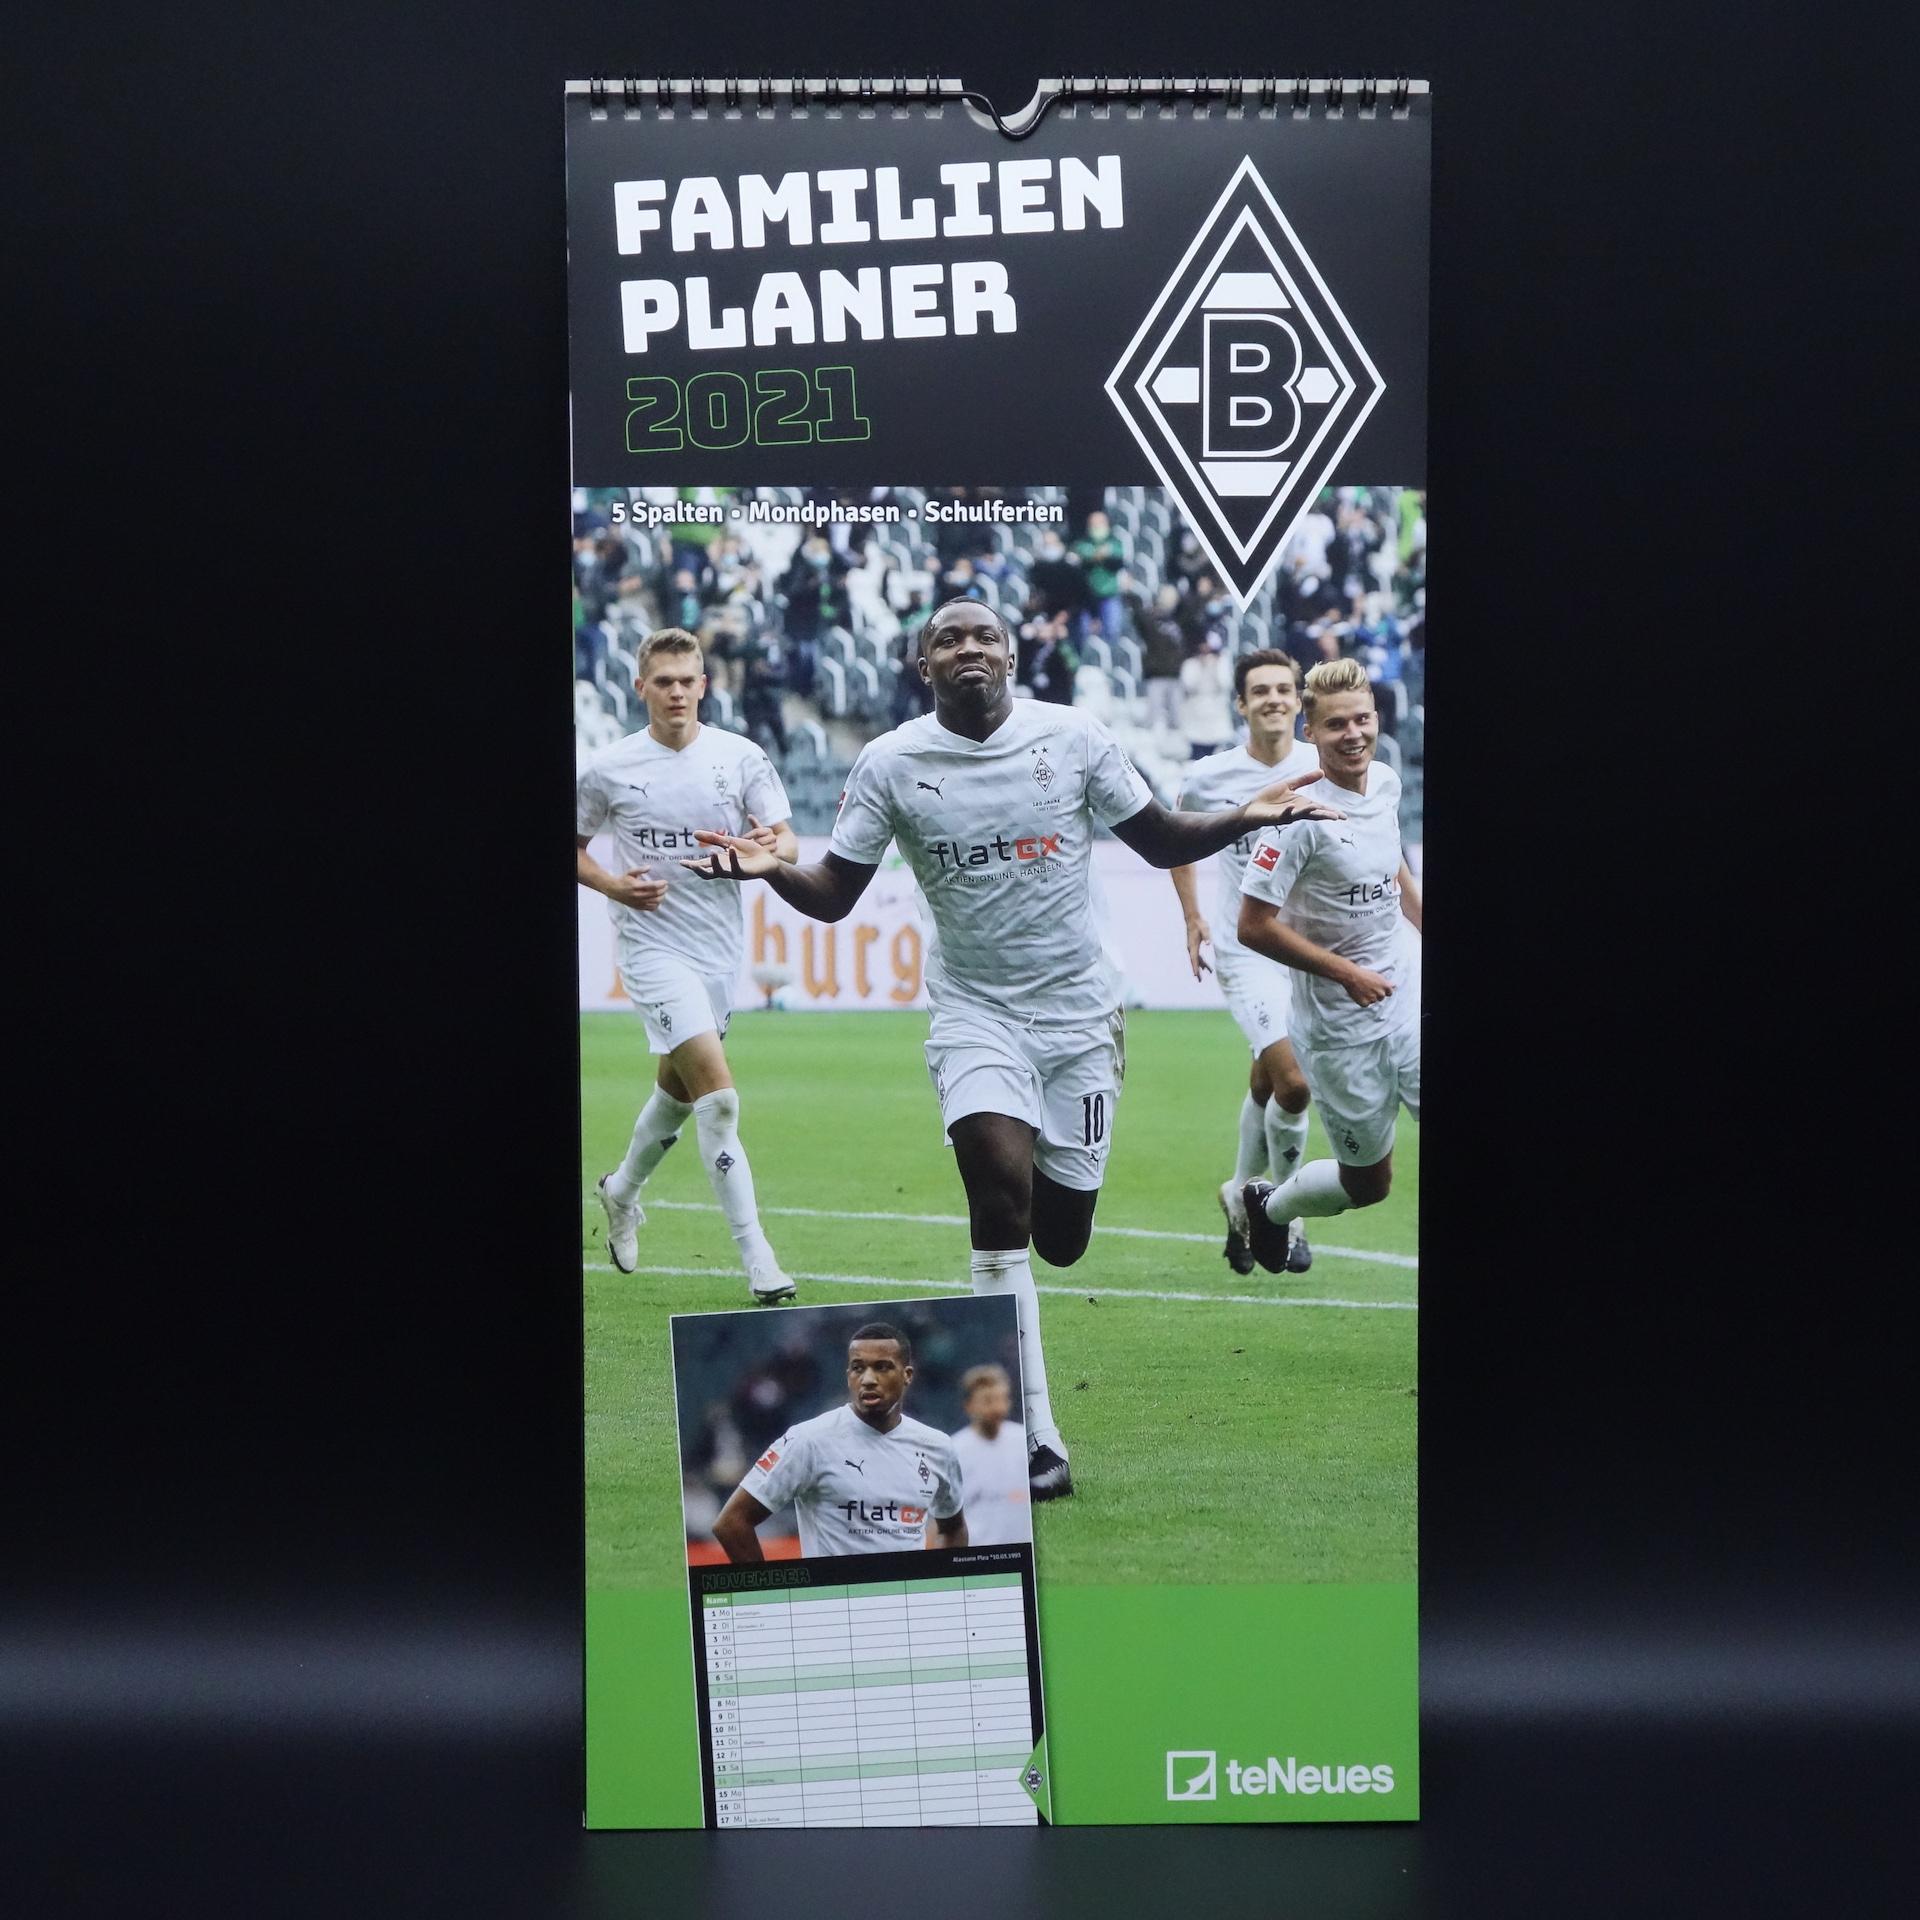 Borussia Mönchengladbach Familien Planer 2021